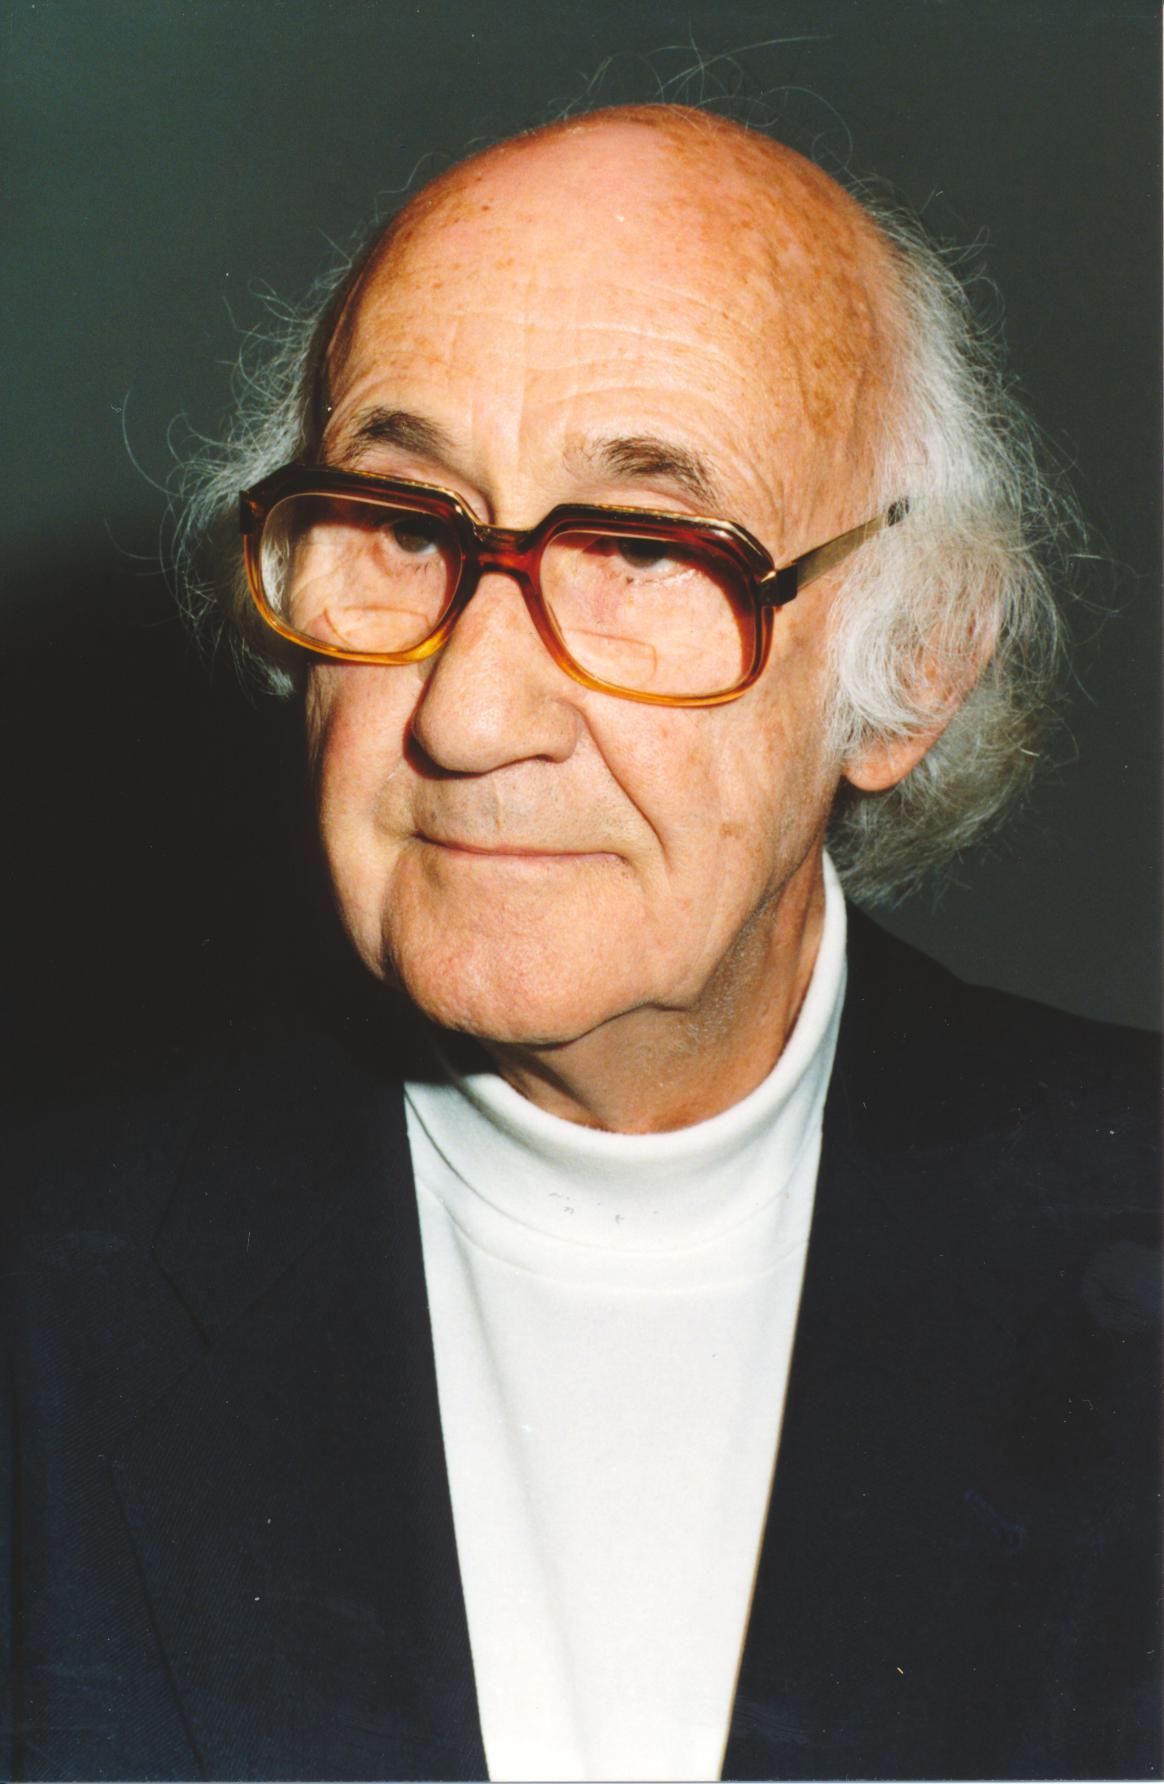 XV. Imago Mundi-Kongress 1995, Innsbruck, Prof. Dr. Arthur H. Hoffmann